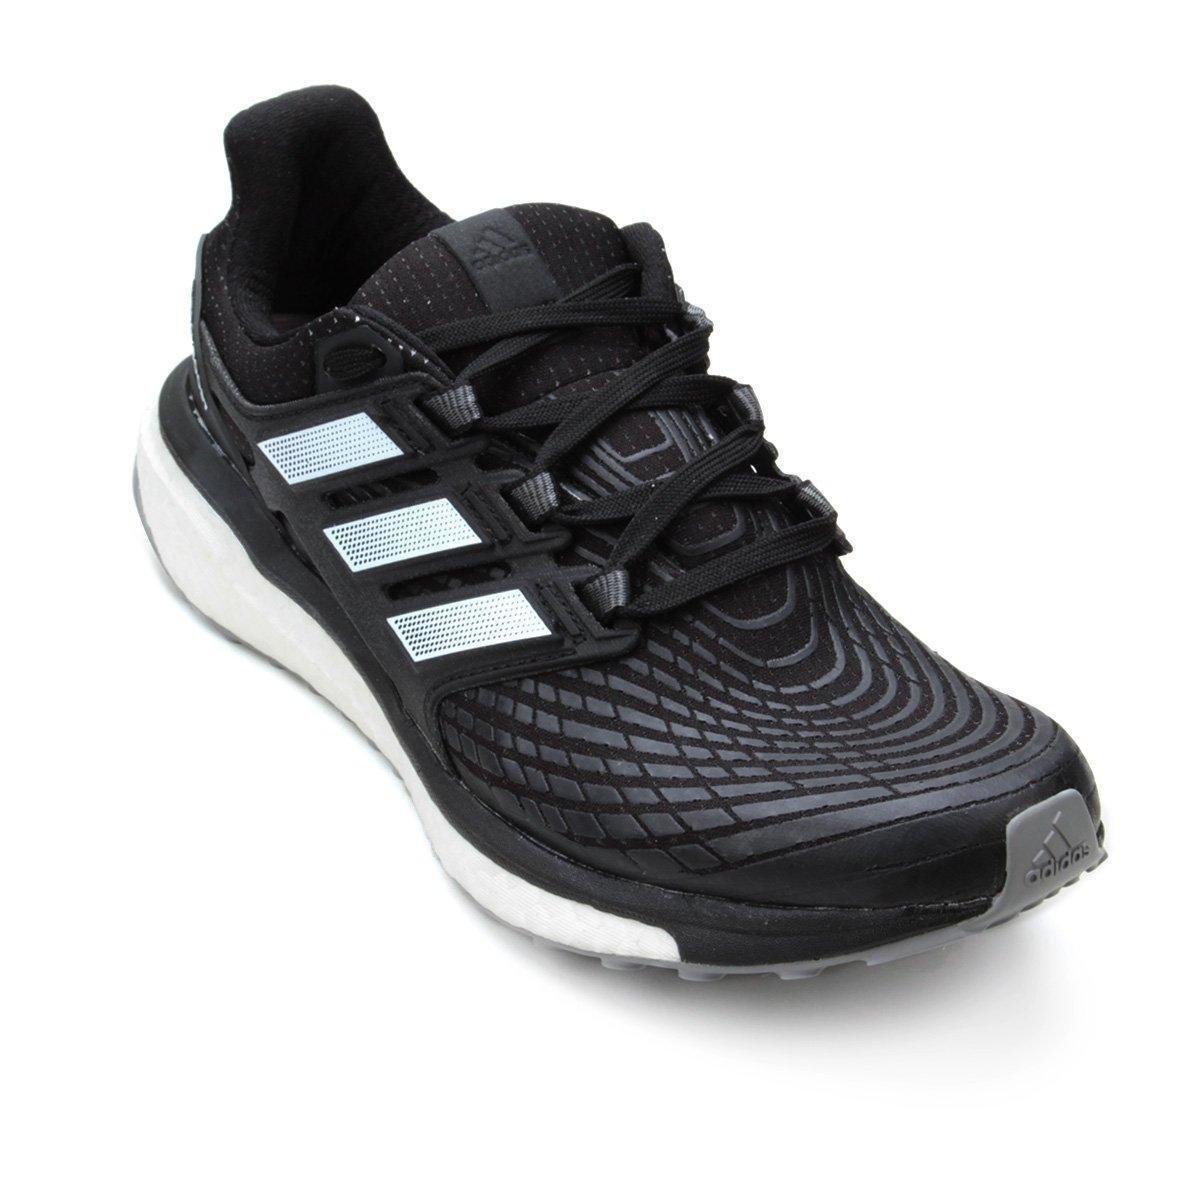 65e33a0648139 Tênis Adidas Energy Boost Masculino - Preto e Branco - Compre Agora ...